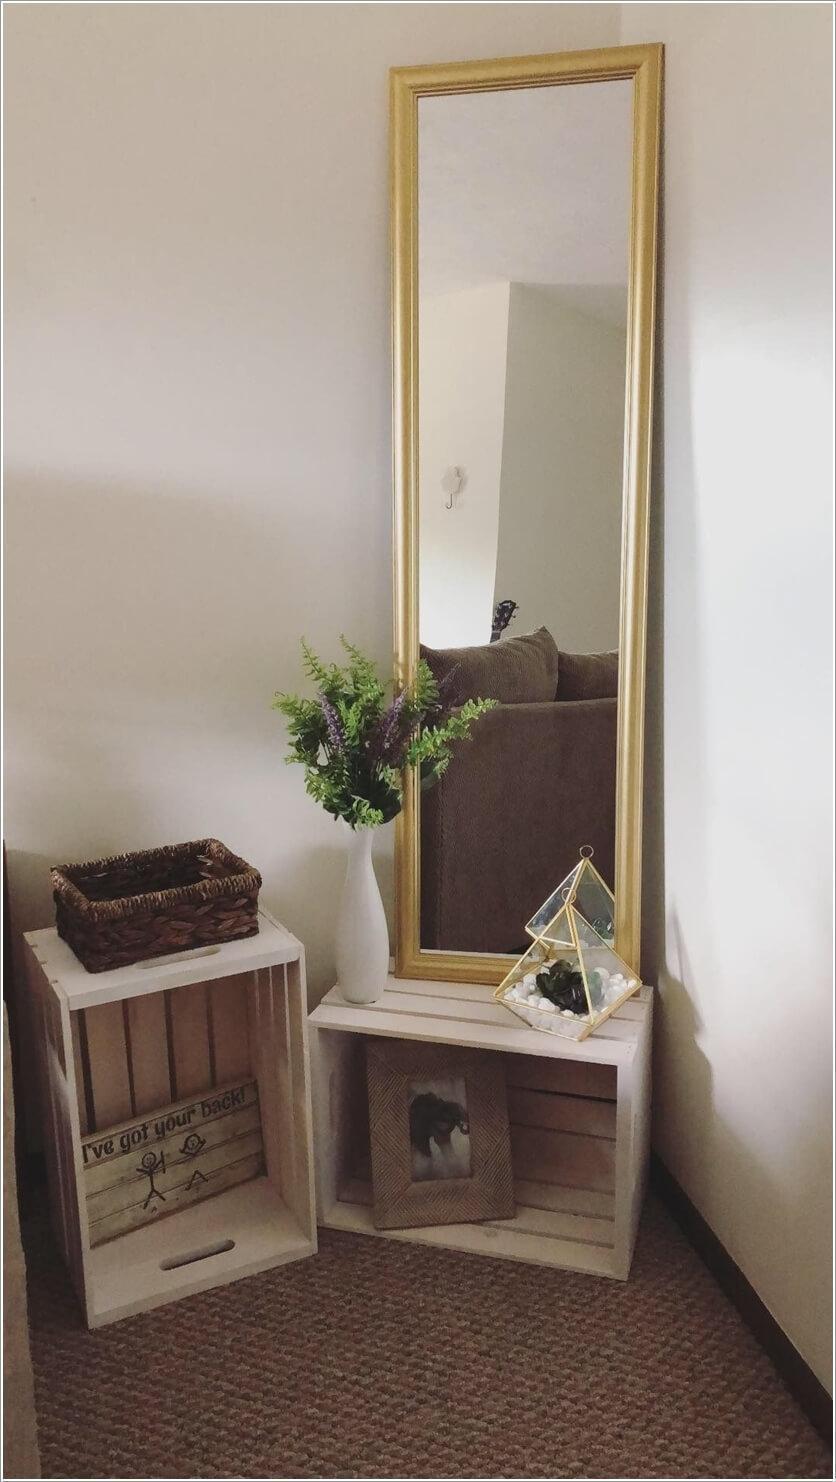 Дешевые идеи декора квартиры 2 | Дока-Мастер